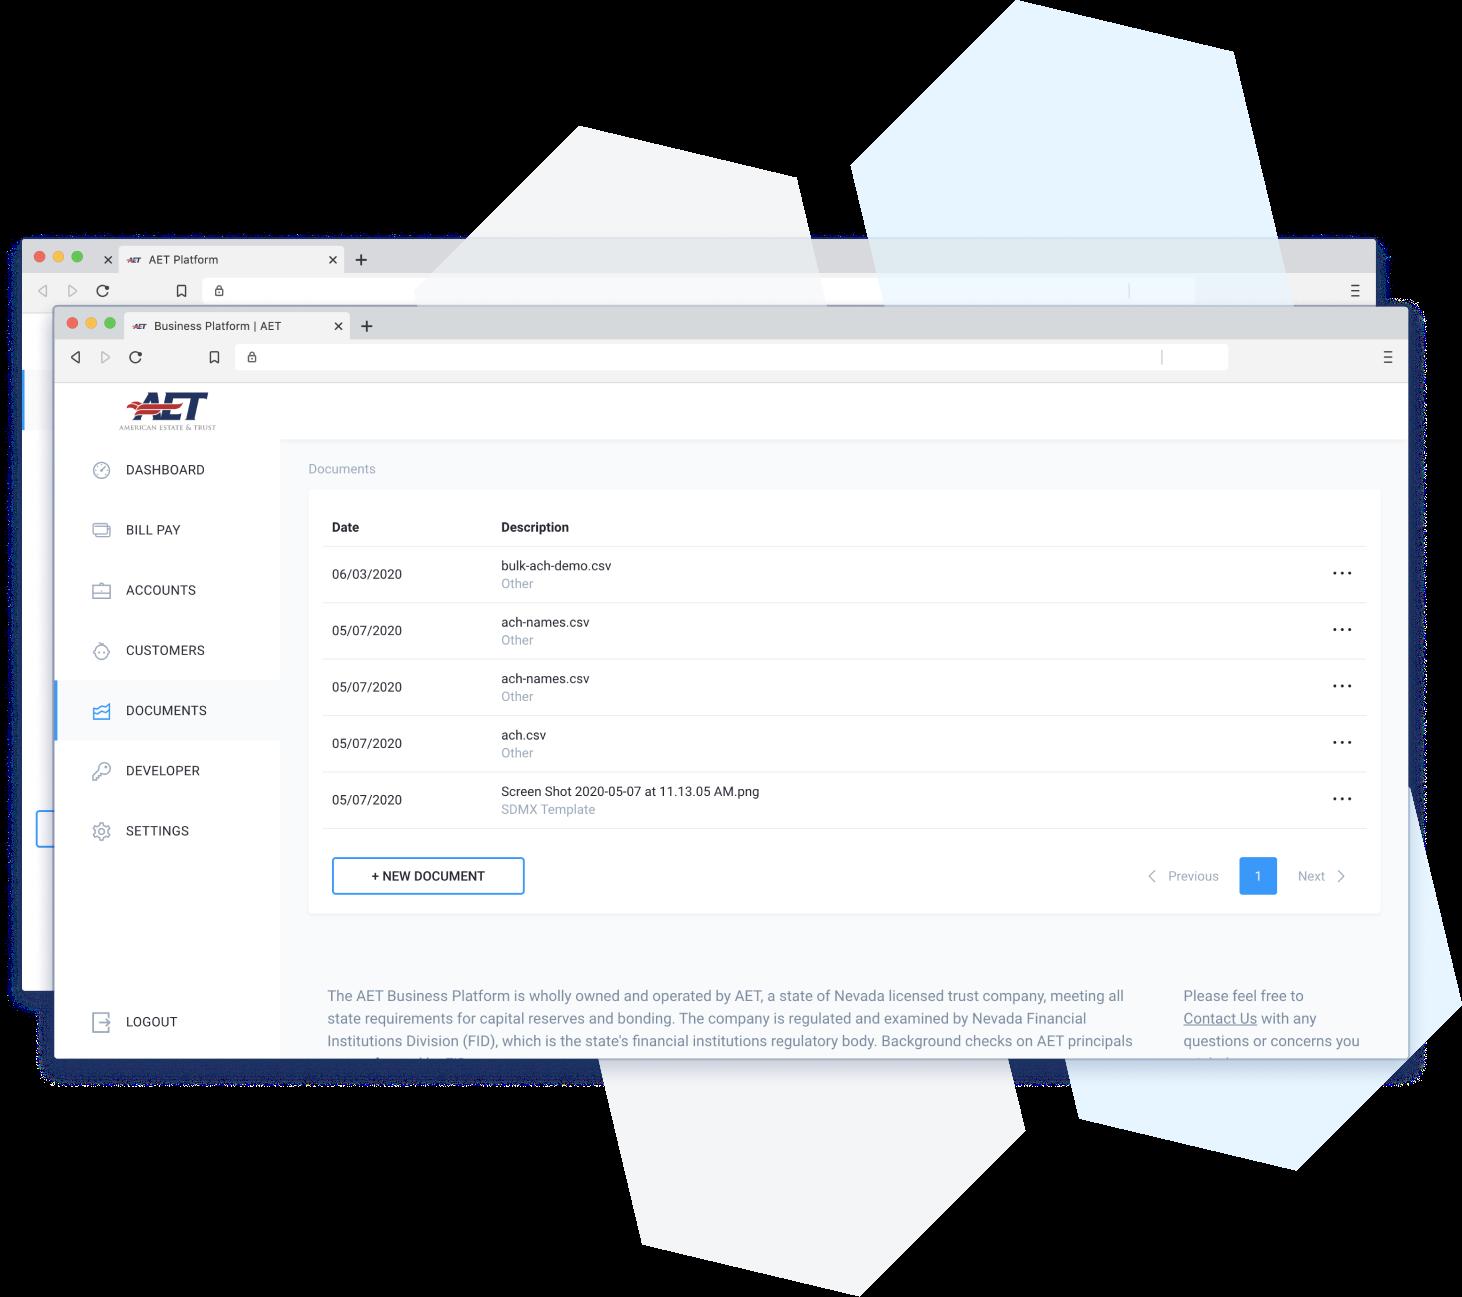 business platform documents